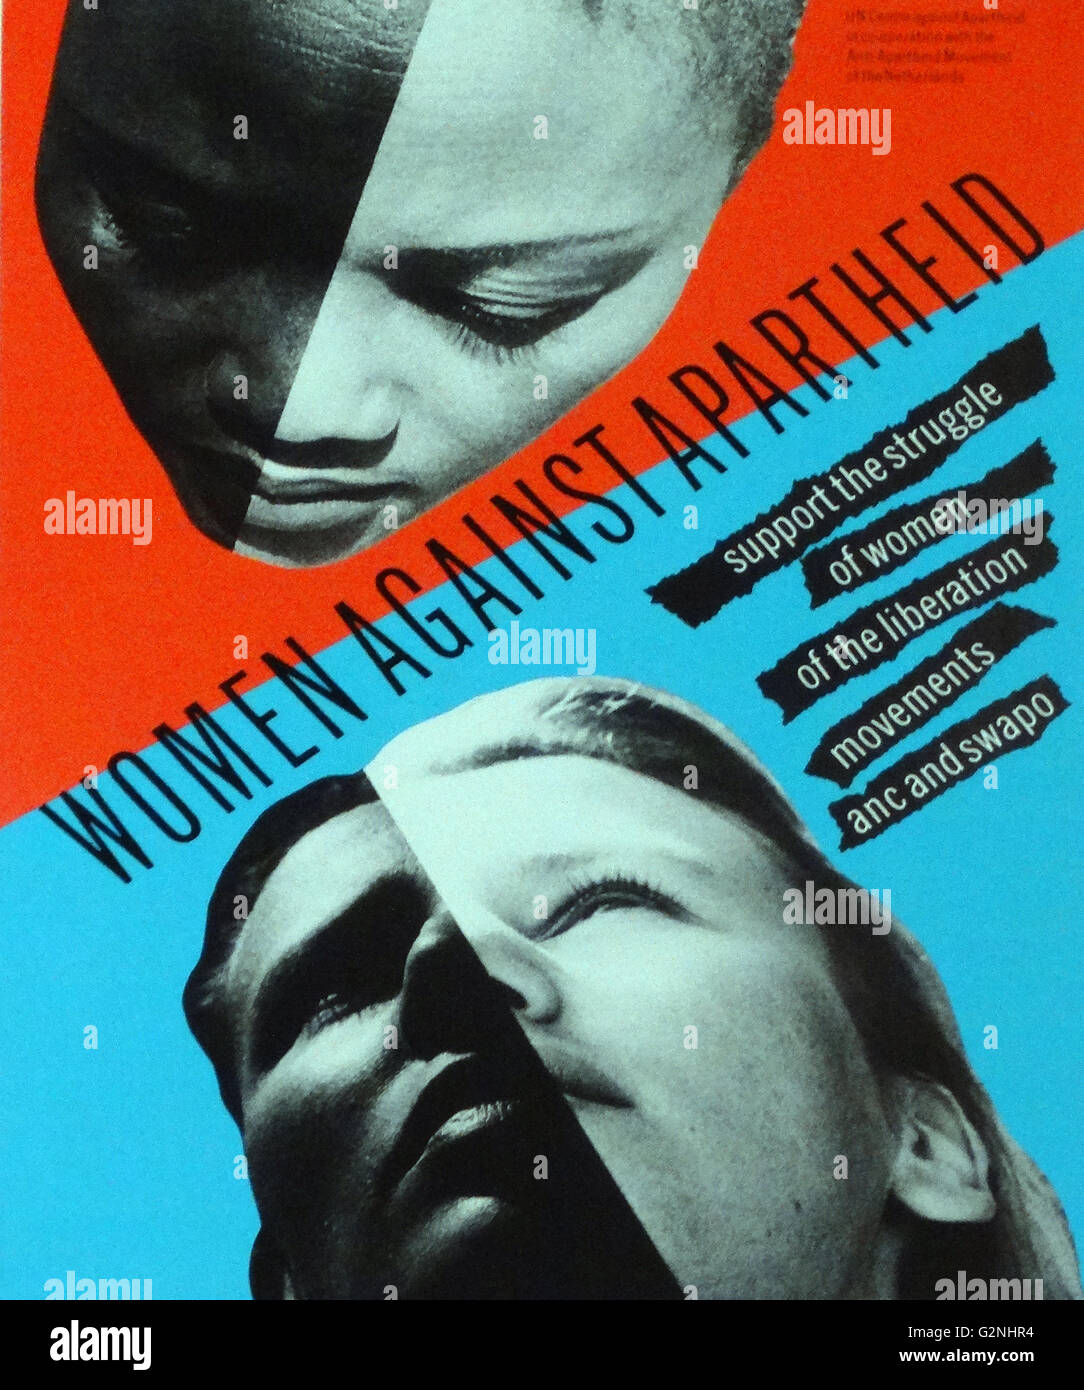 Poster for Women against Apartheid - Stock Image